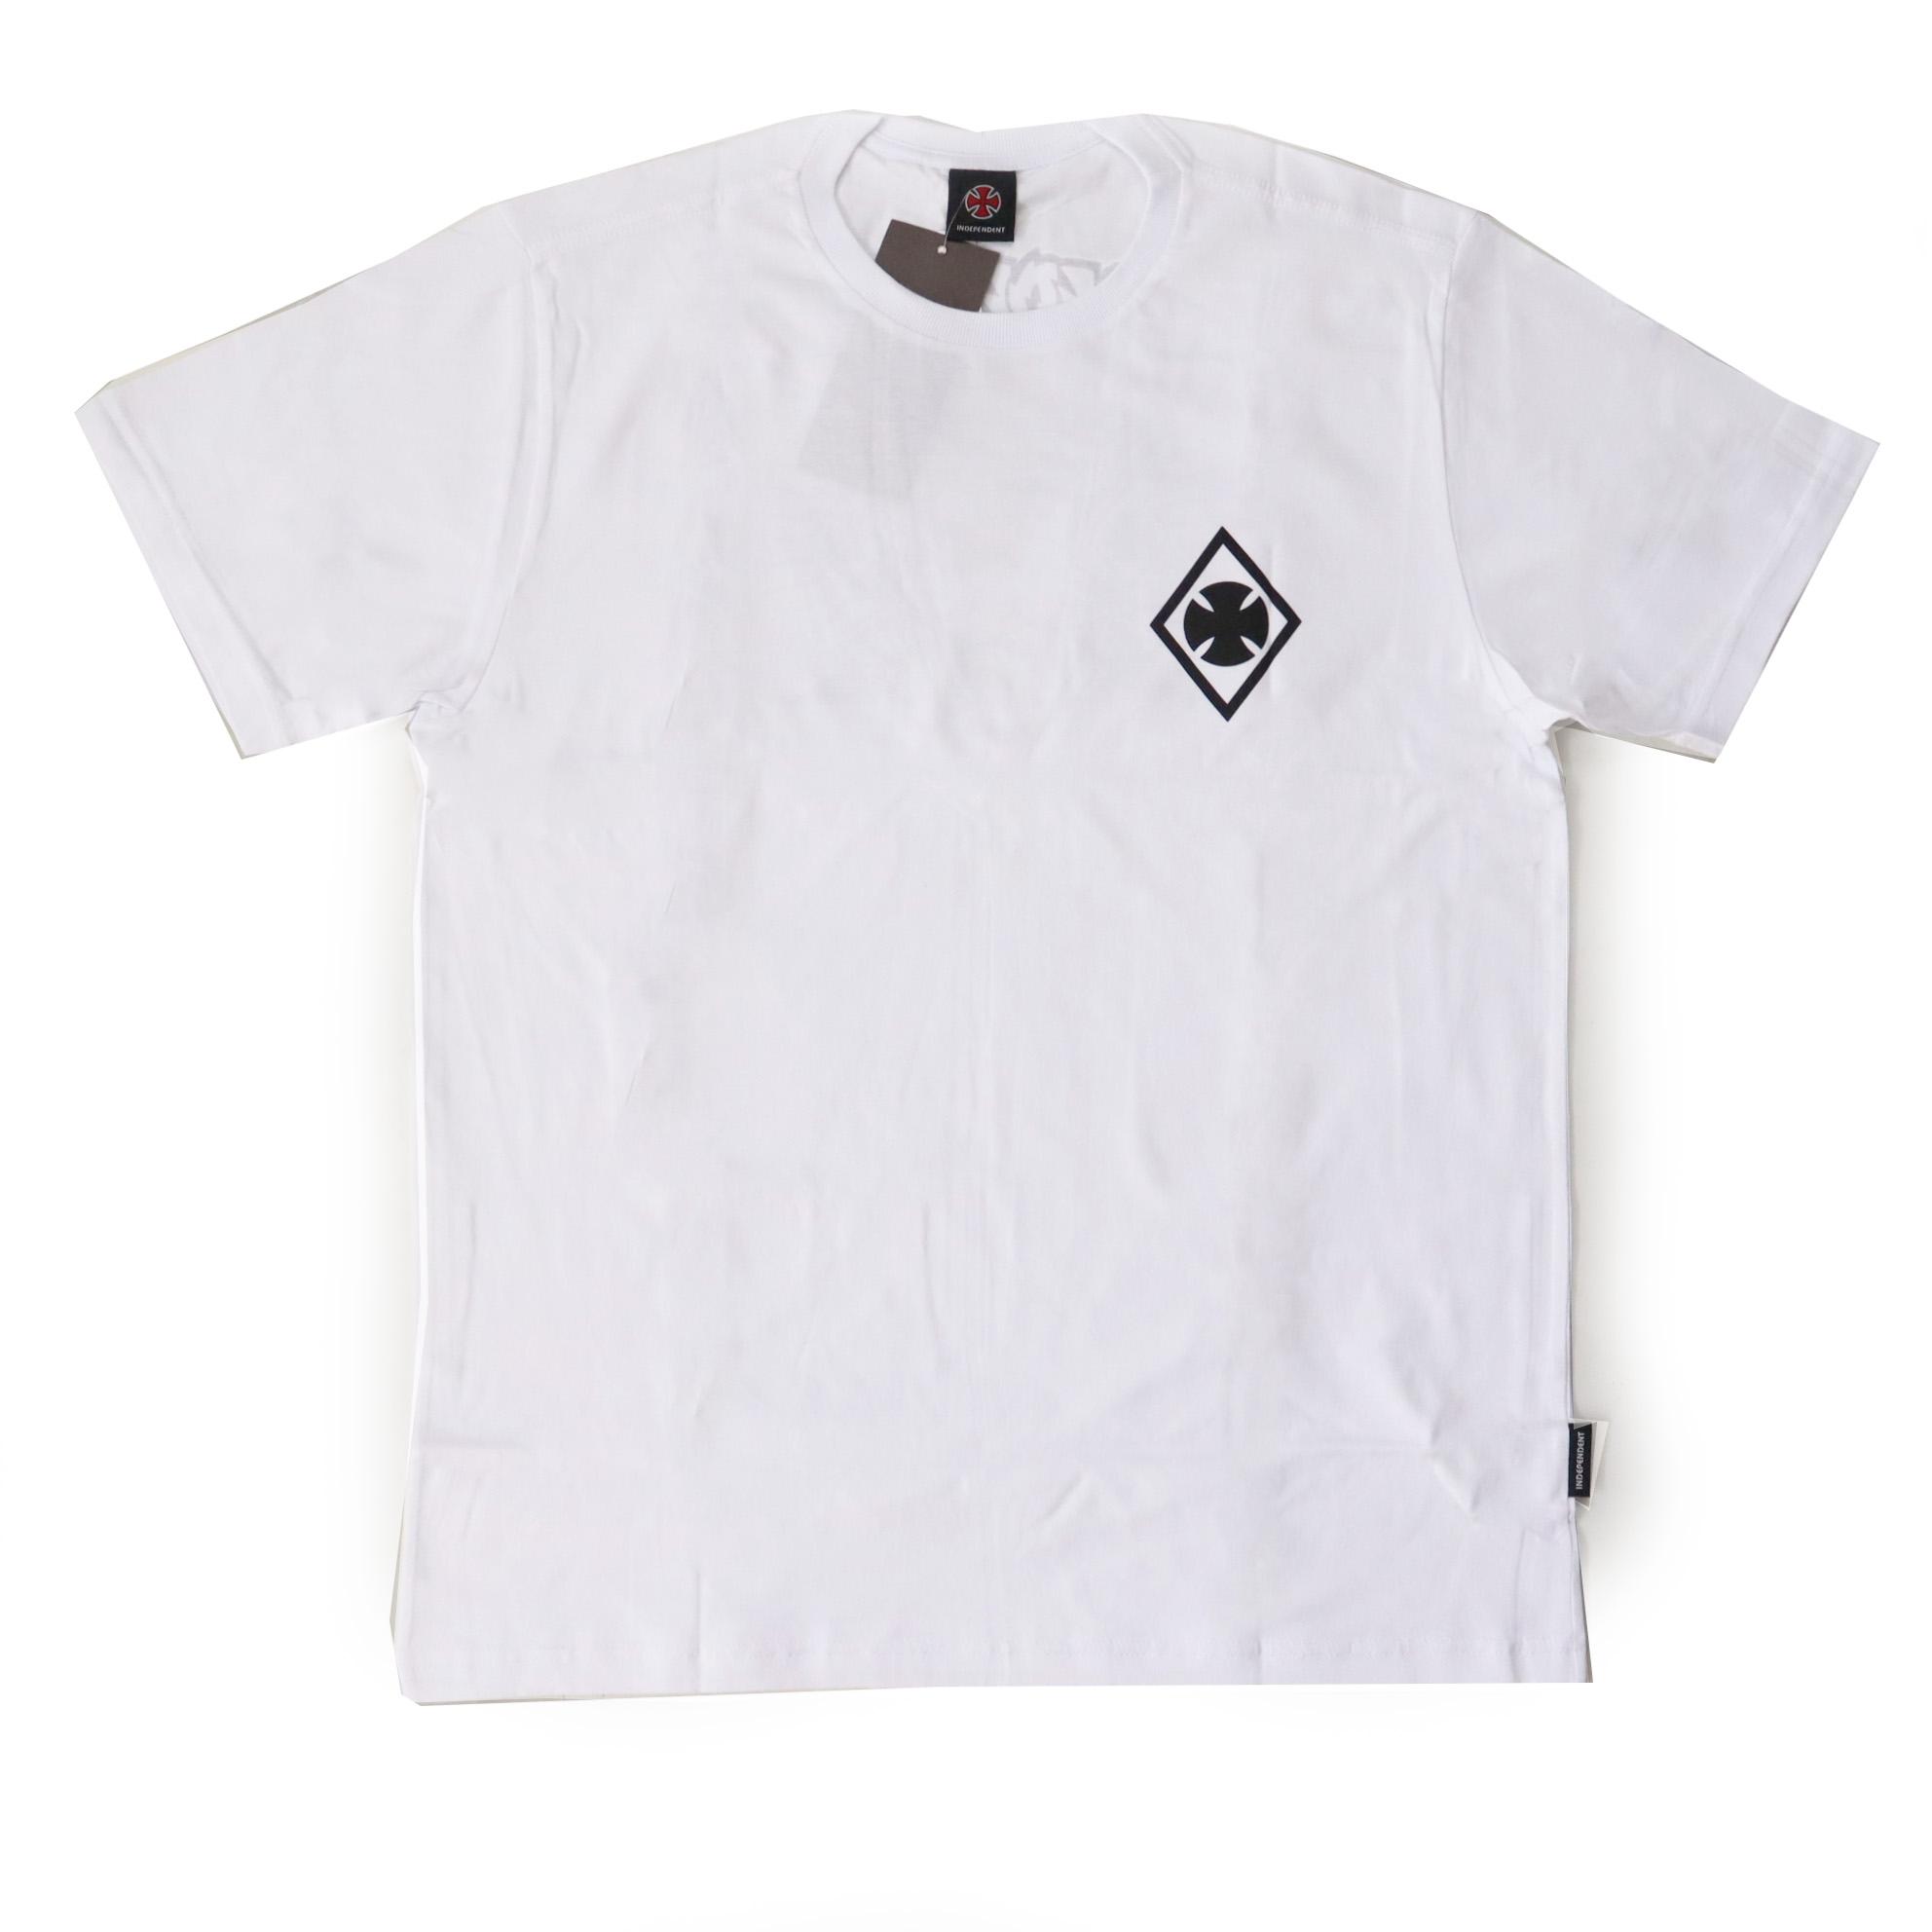 Camiseta Independent Ripped - Branco